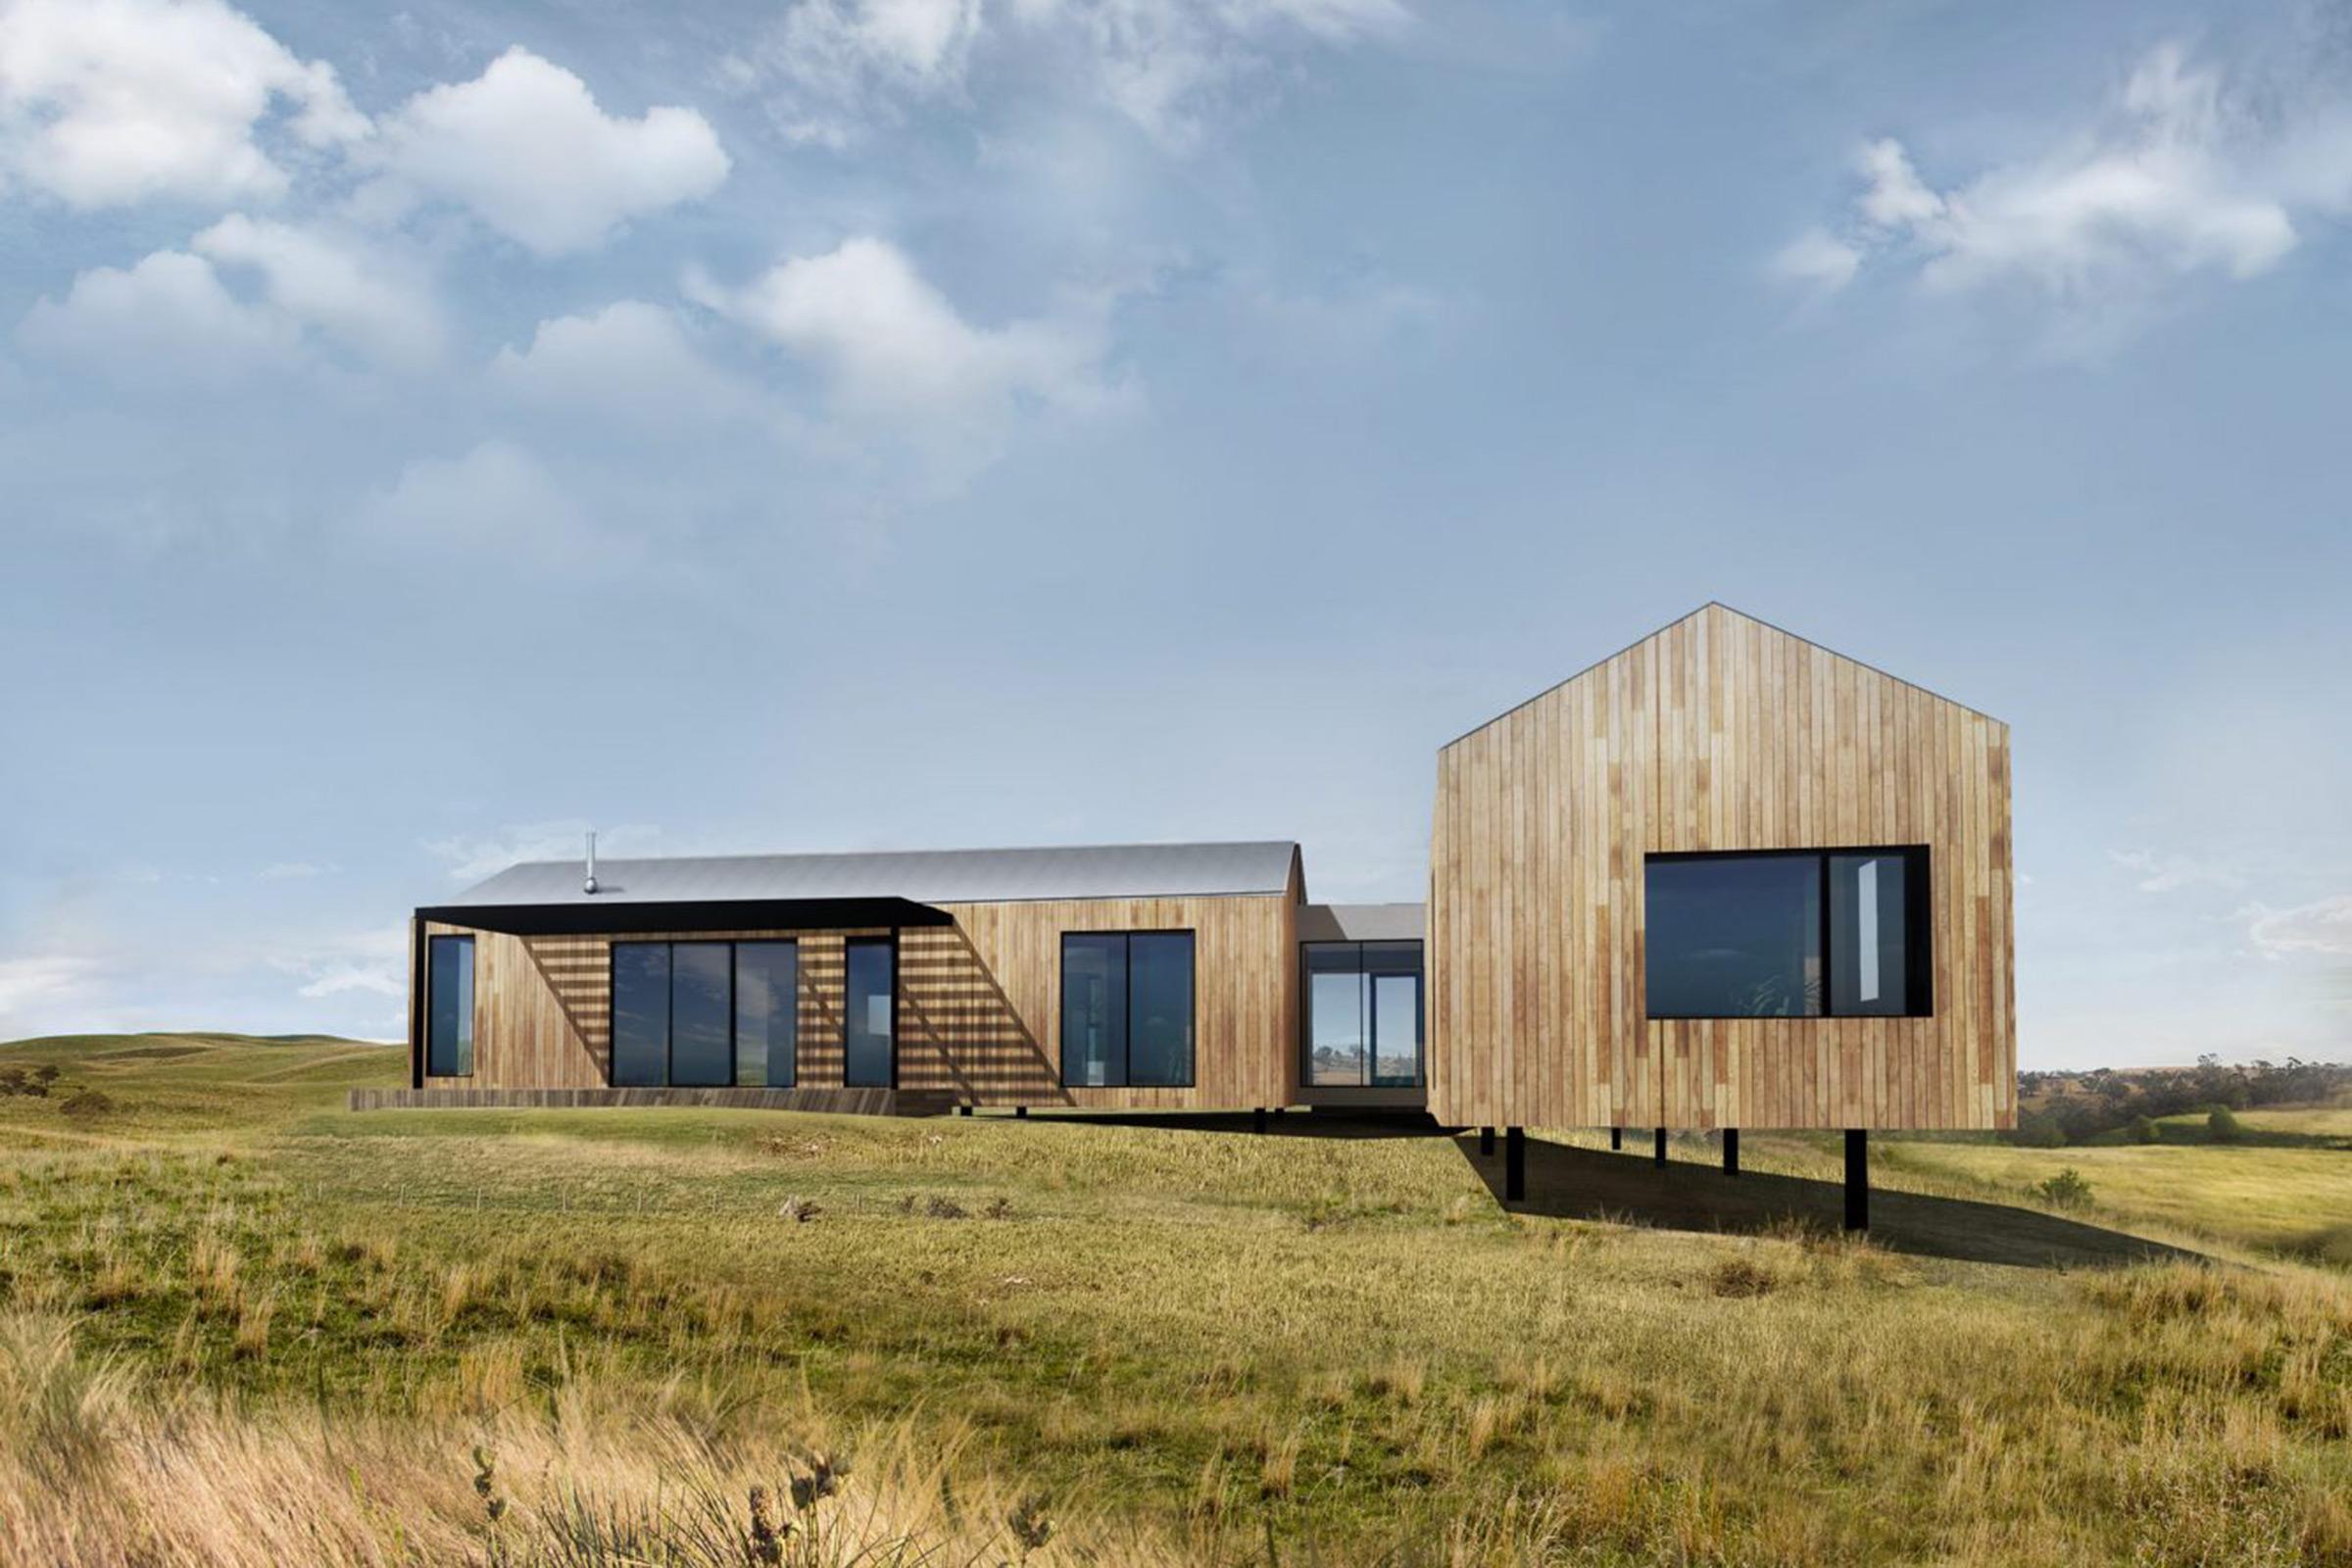 vivienda modular en madera